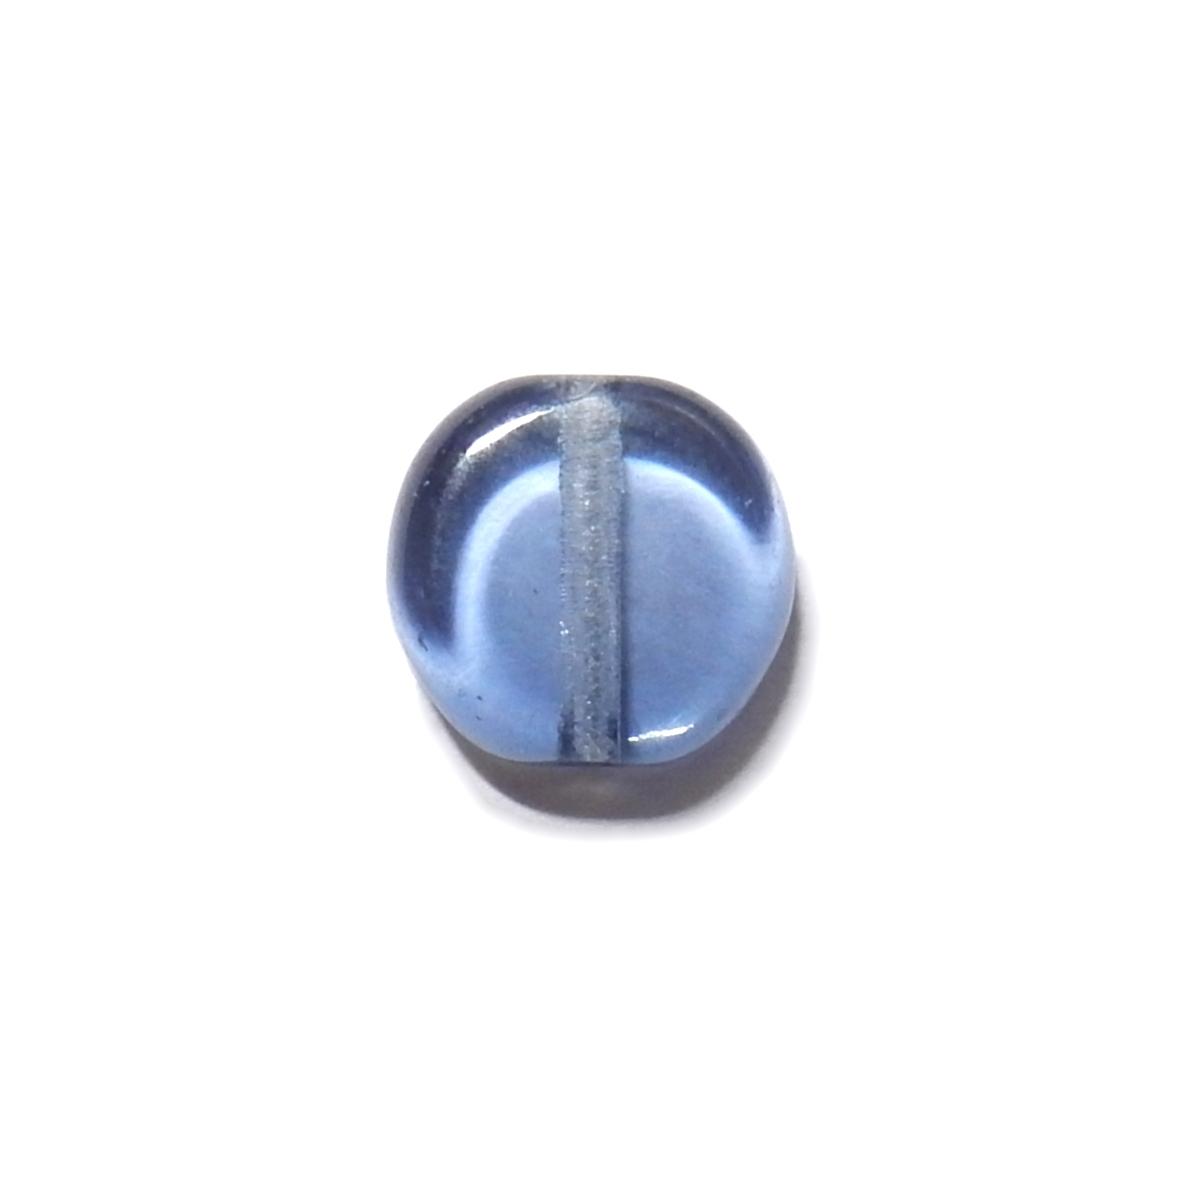 Glass Pill Shaped Bead 8x3mm - Transparent Jean Blue